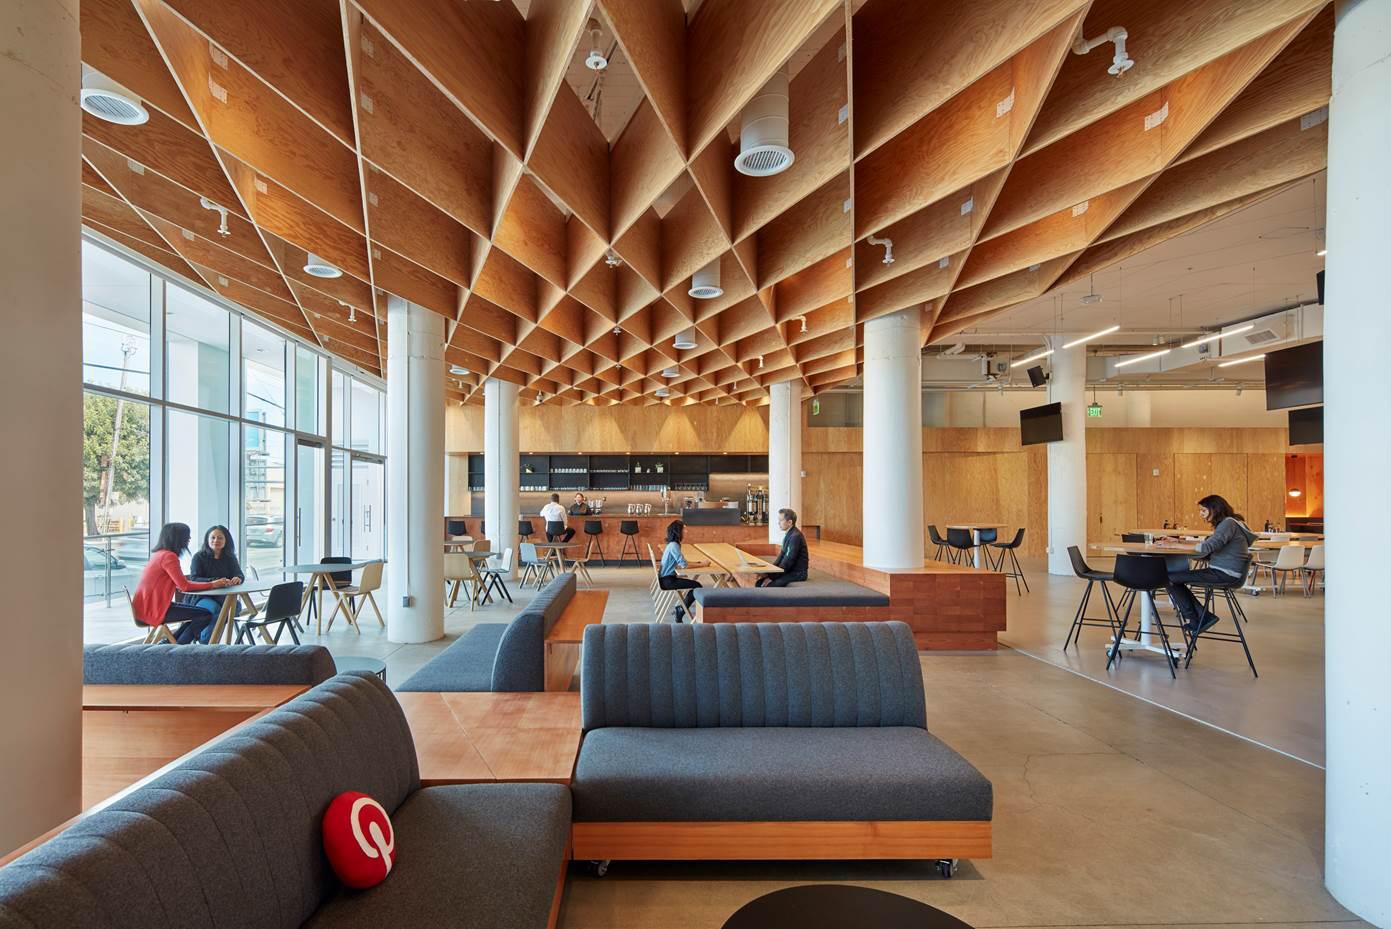 Pinterest 39 s new architectural headquarters in san francisco hypebeast Interior design companies in san francisco